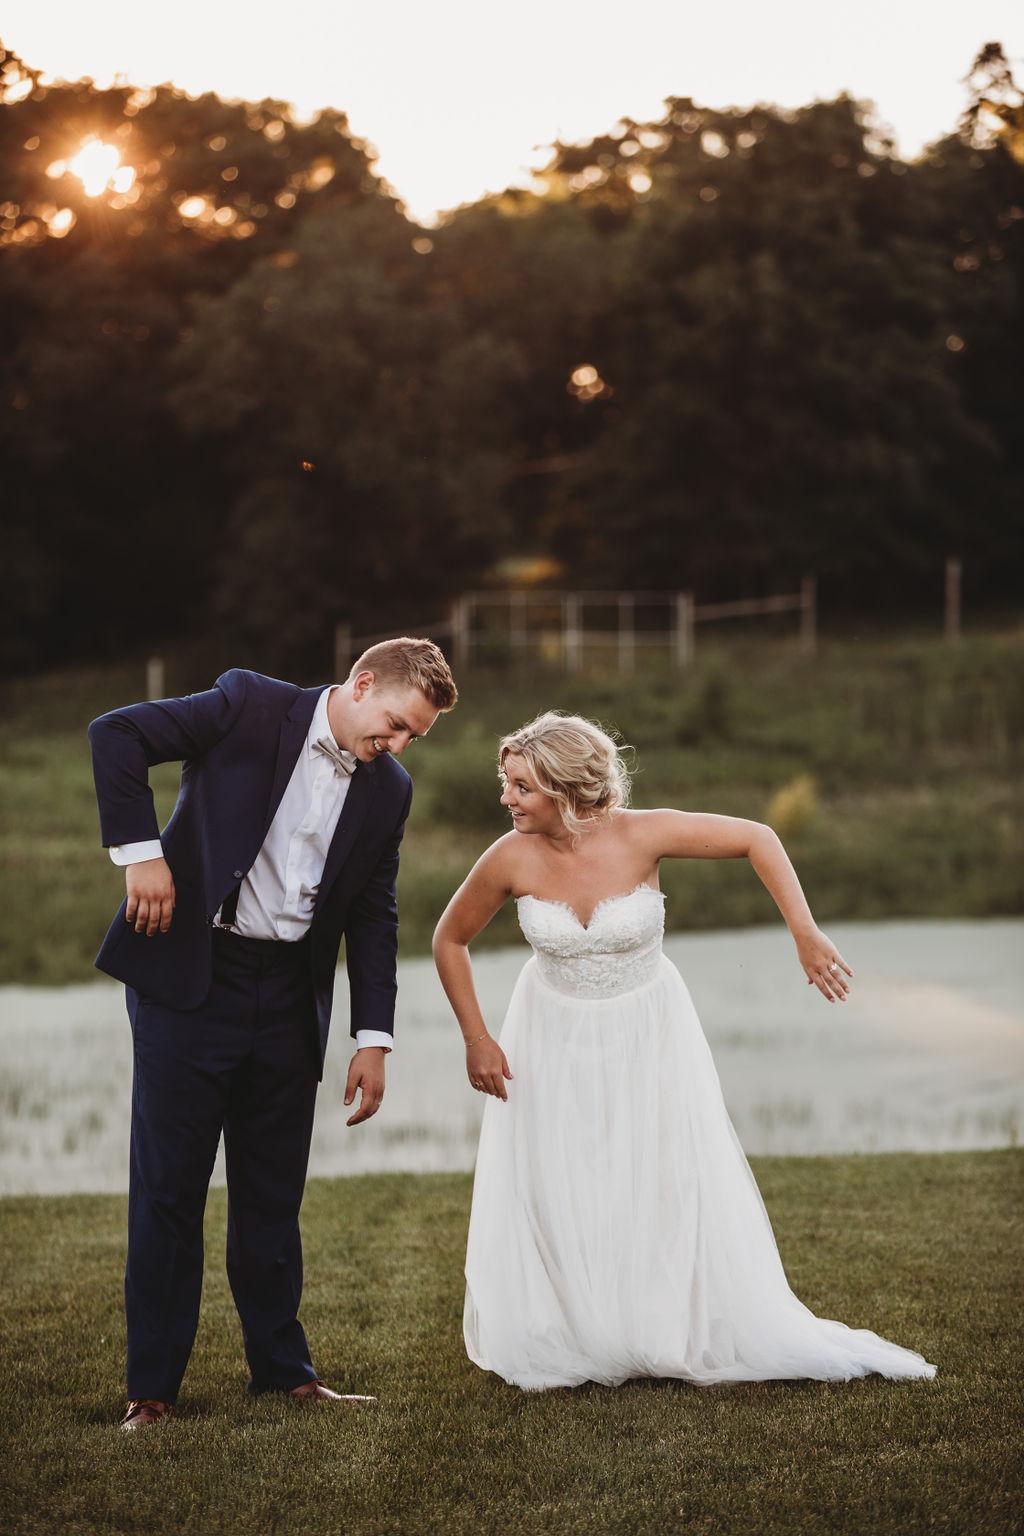 engle-olson-katie-dalton-wedding-clewell-photography-32.jpg